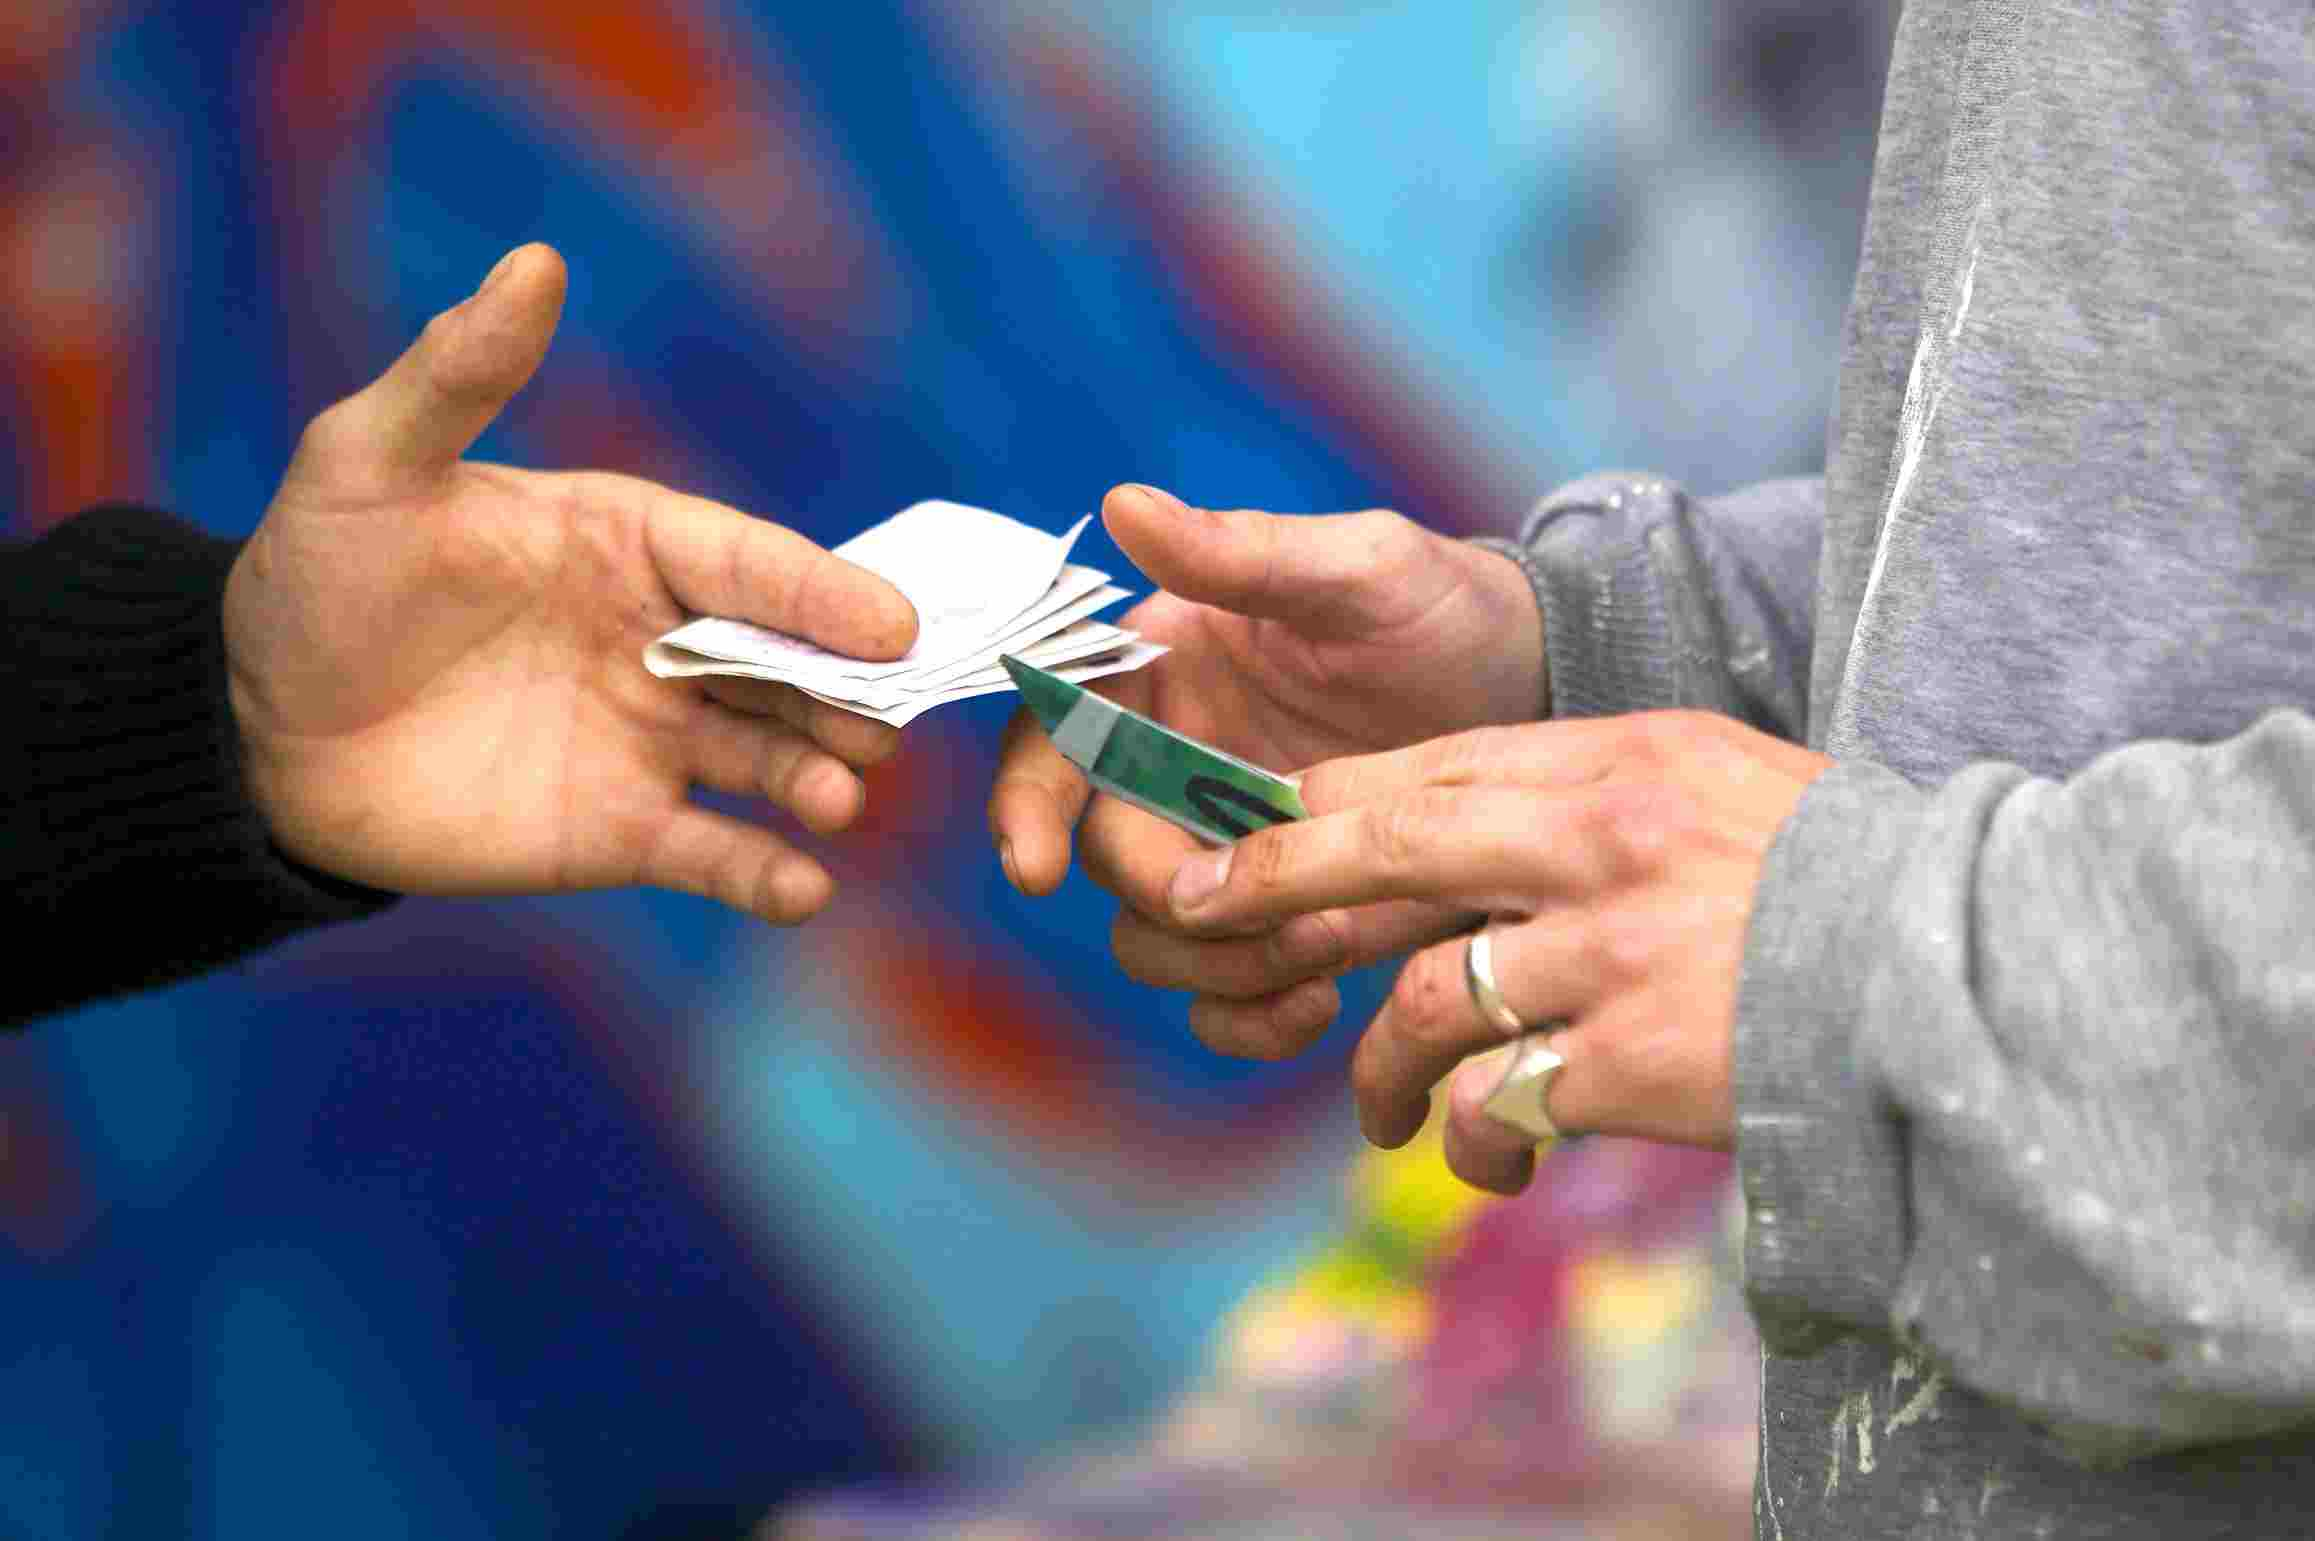 Fake drug dealers in Amsterdam